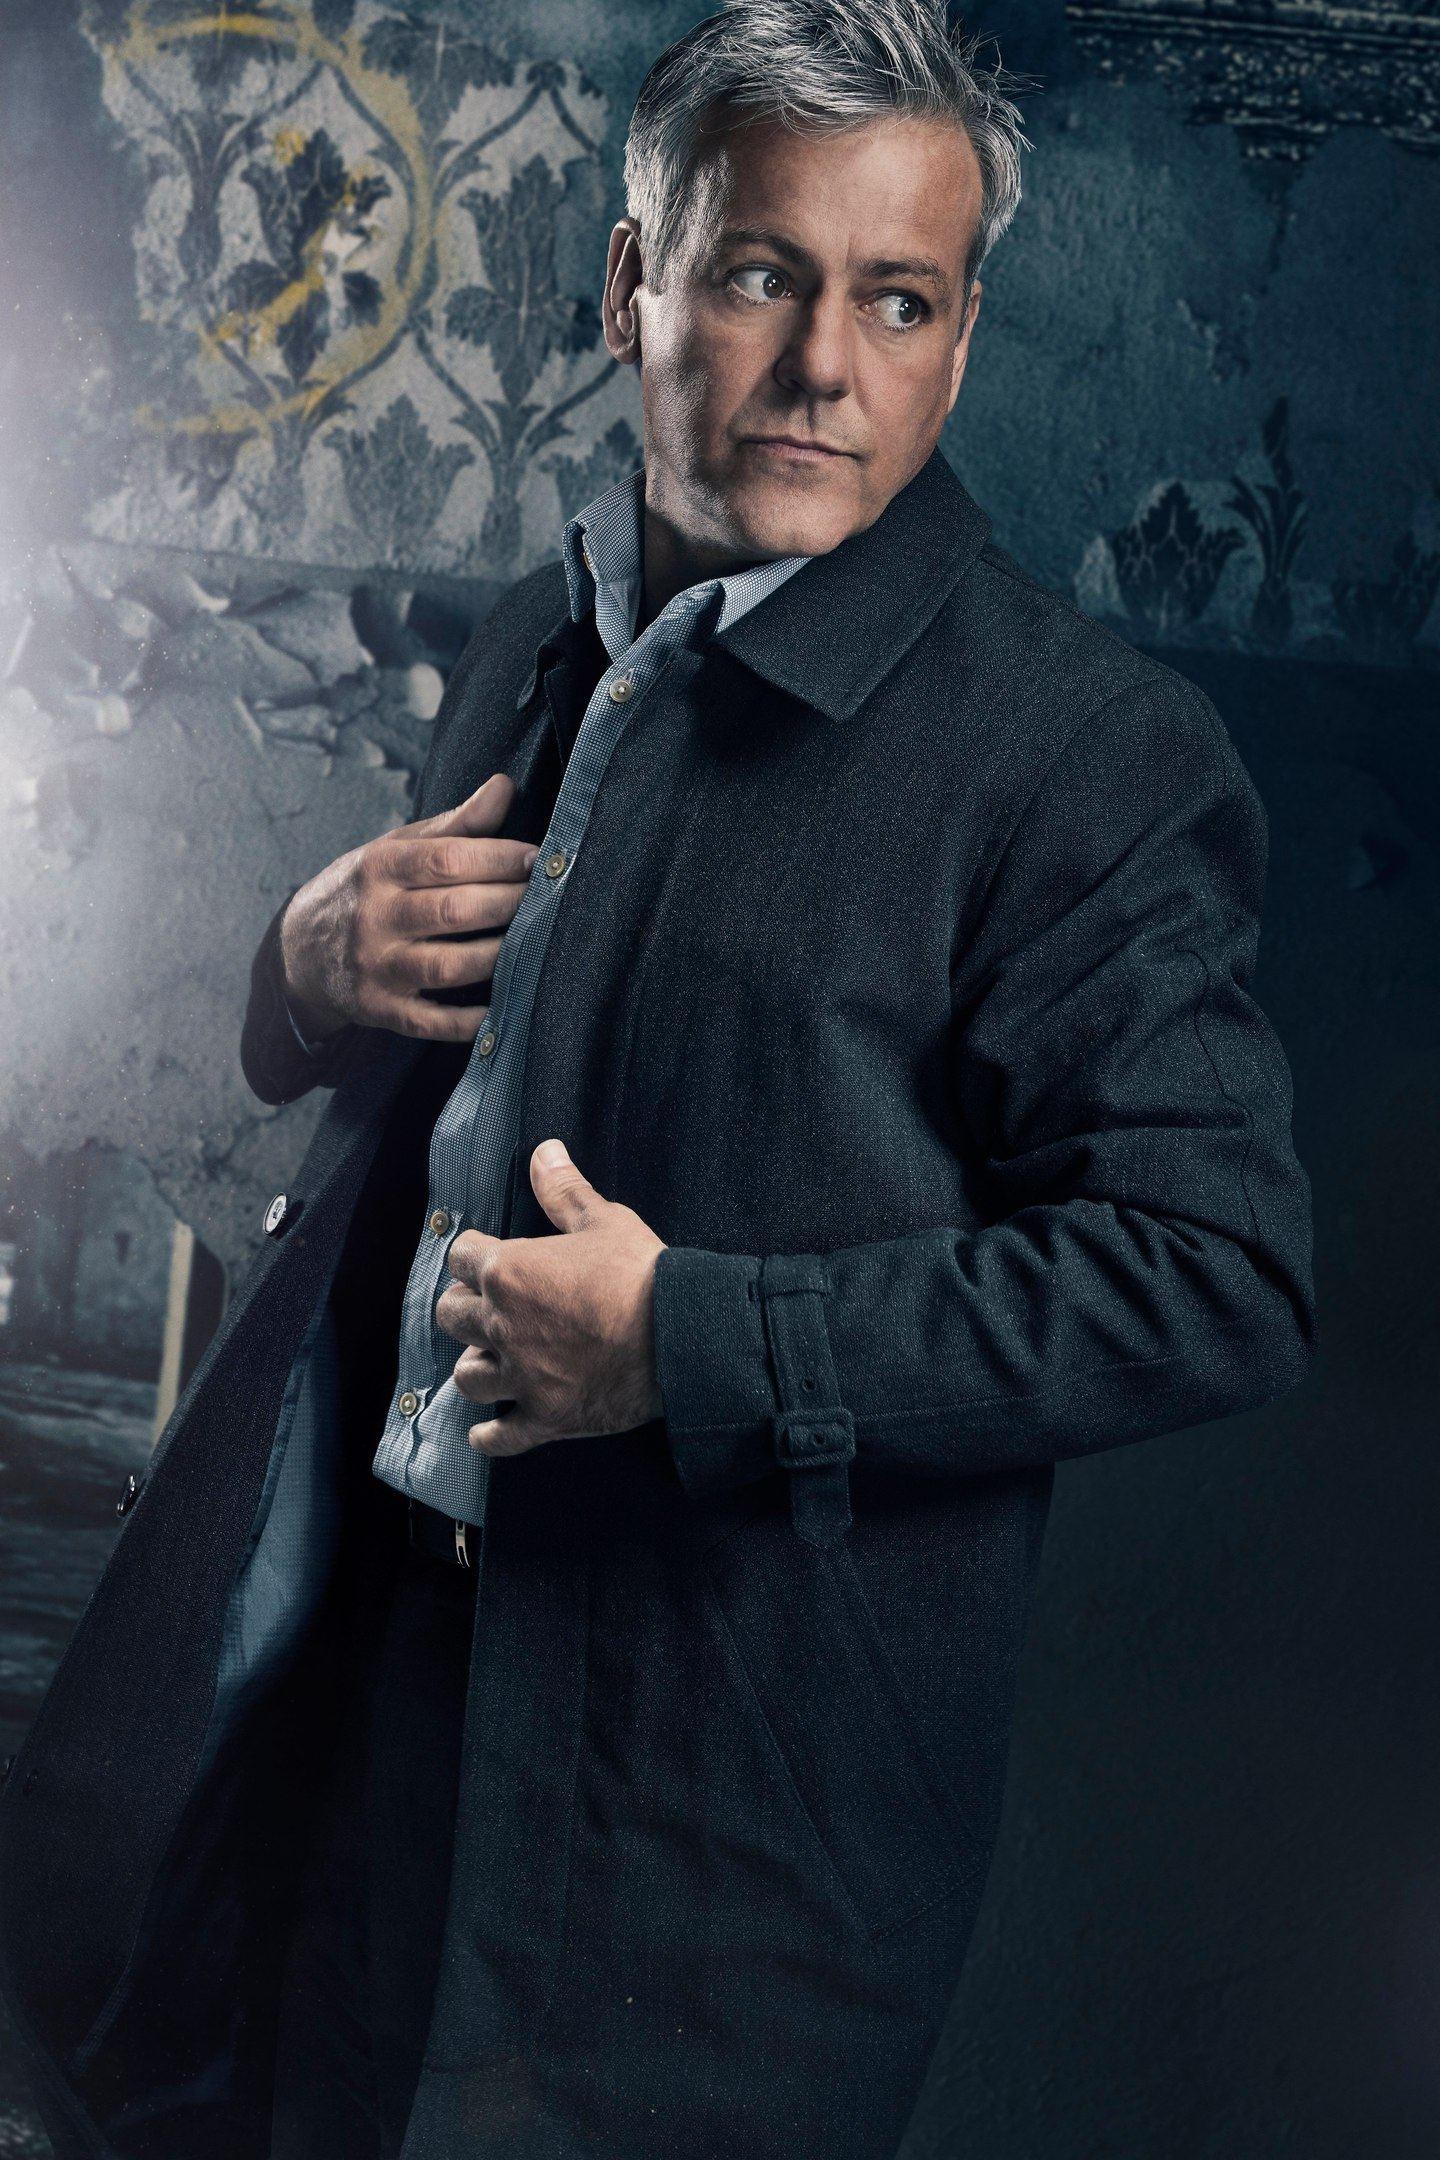 Rupert Graves Sherlock 2017. OriginalsWallpapersRupert GravesSherlock